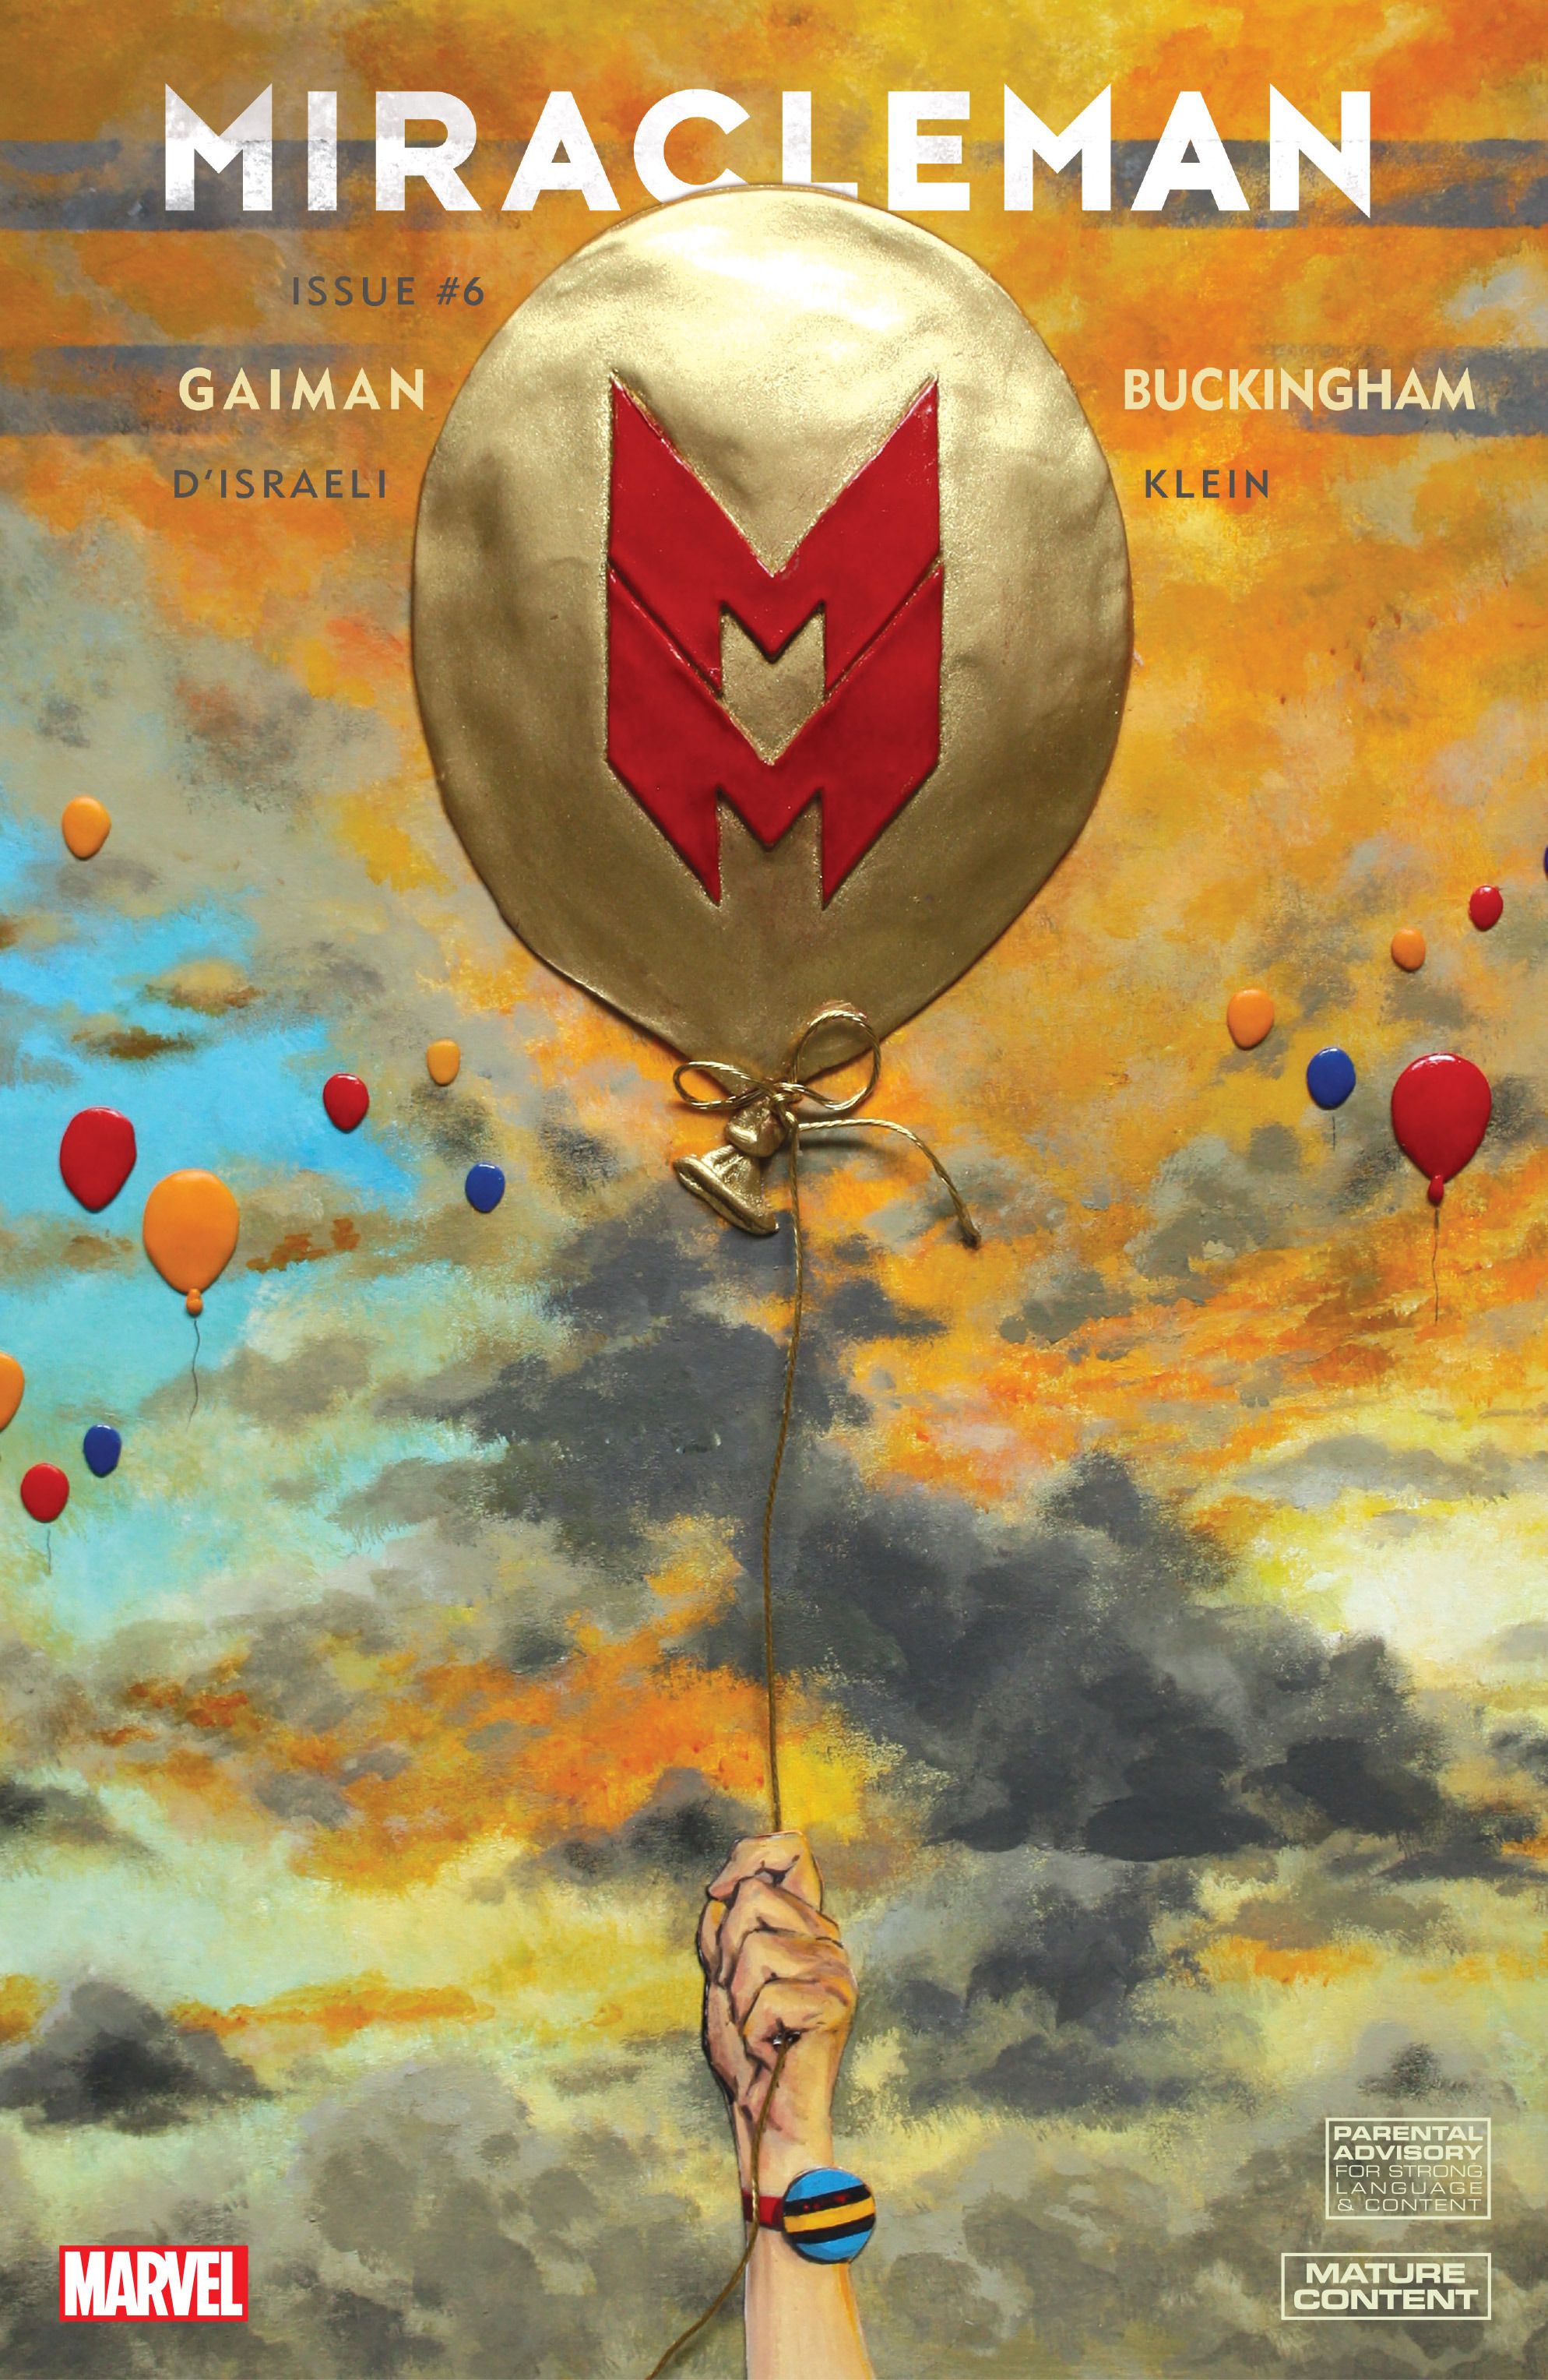 Miracleman by Gaiman & Buckingham Vol 1 6